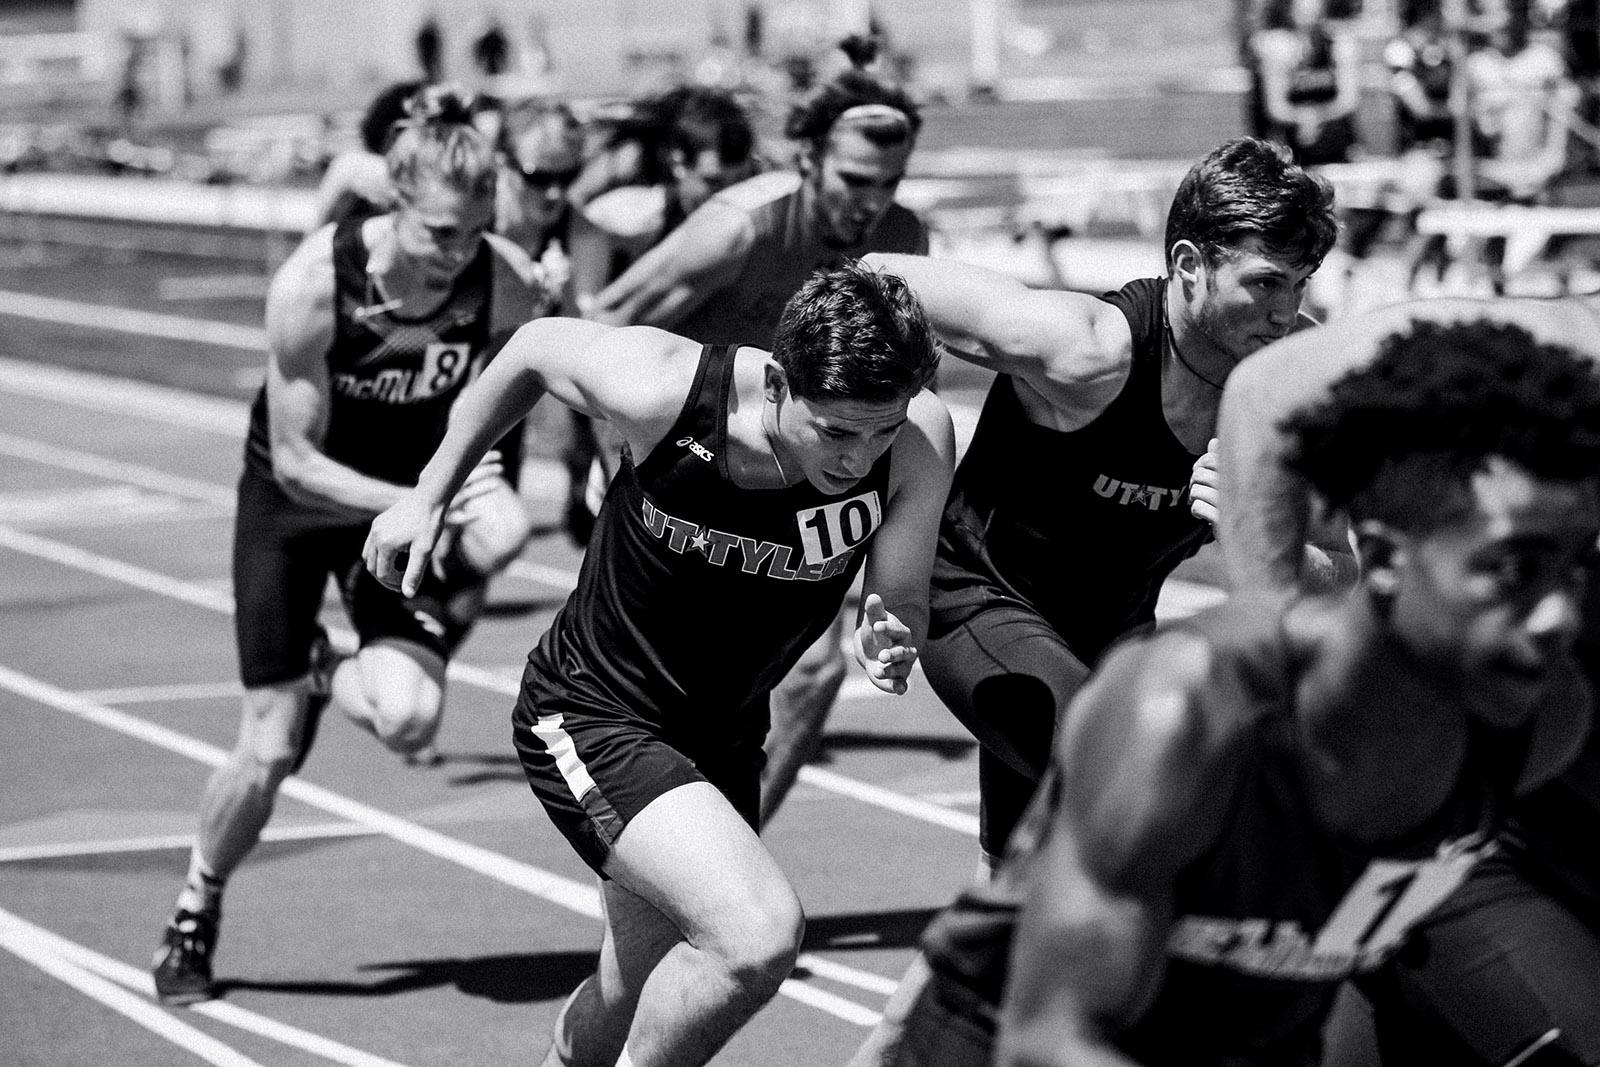 Mindre hastighetstapp på gymmet ger snabbare idrottare på plan